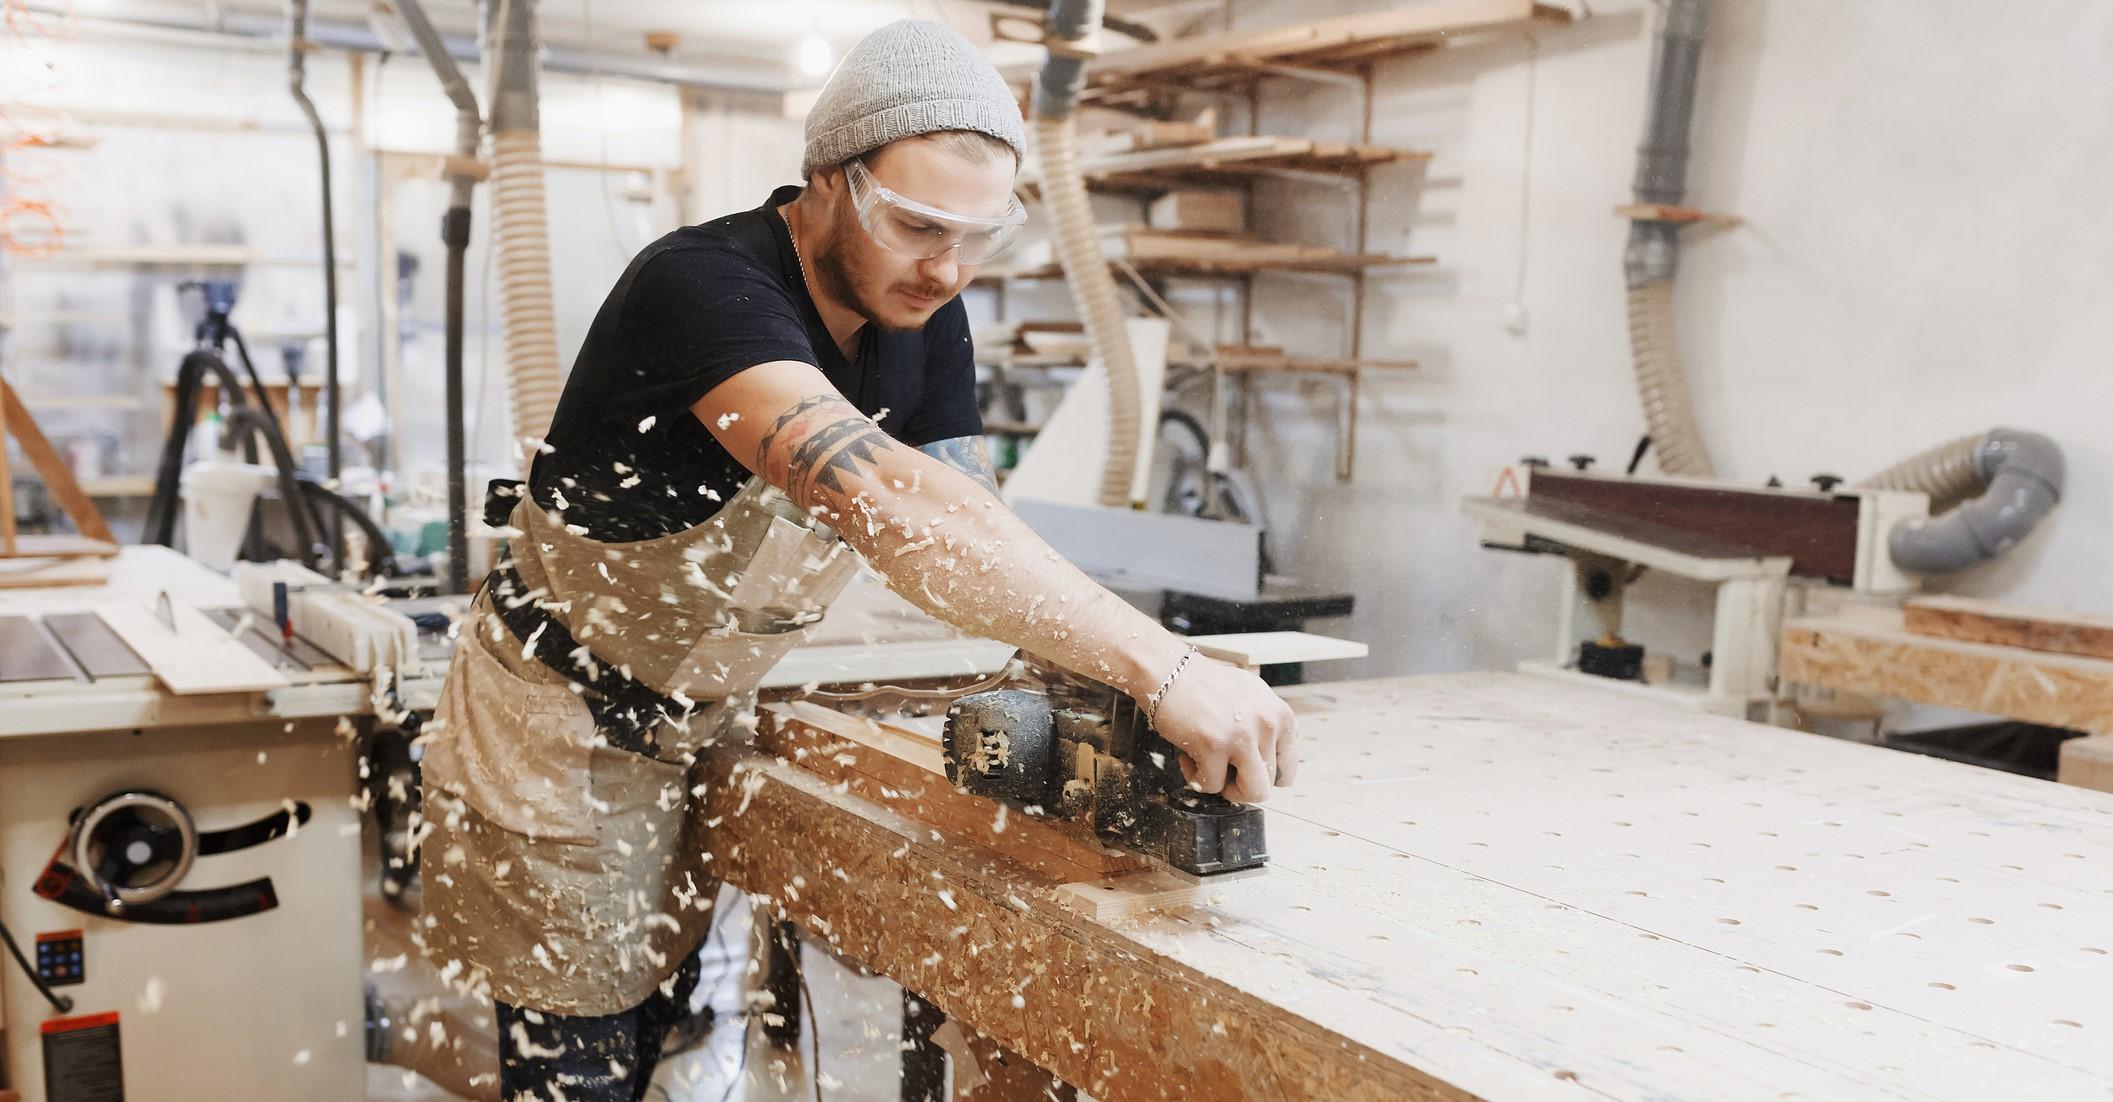 carpenter with tools